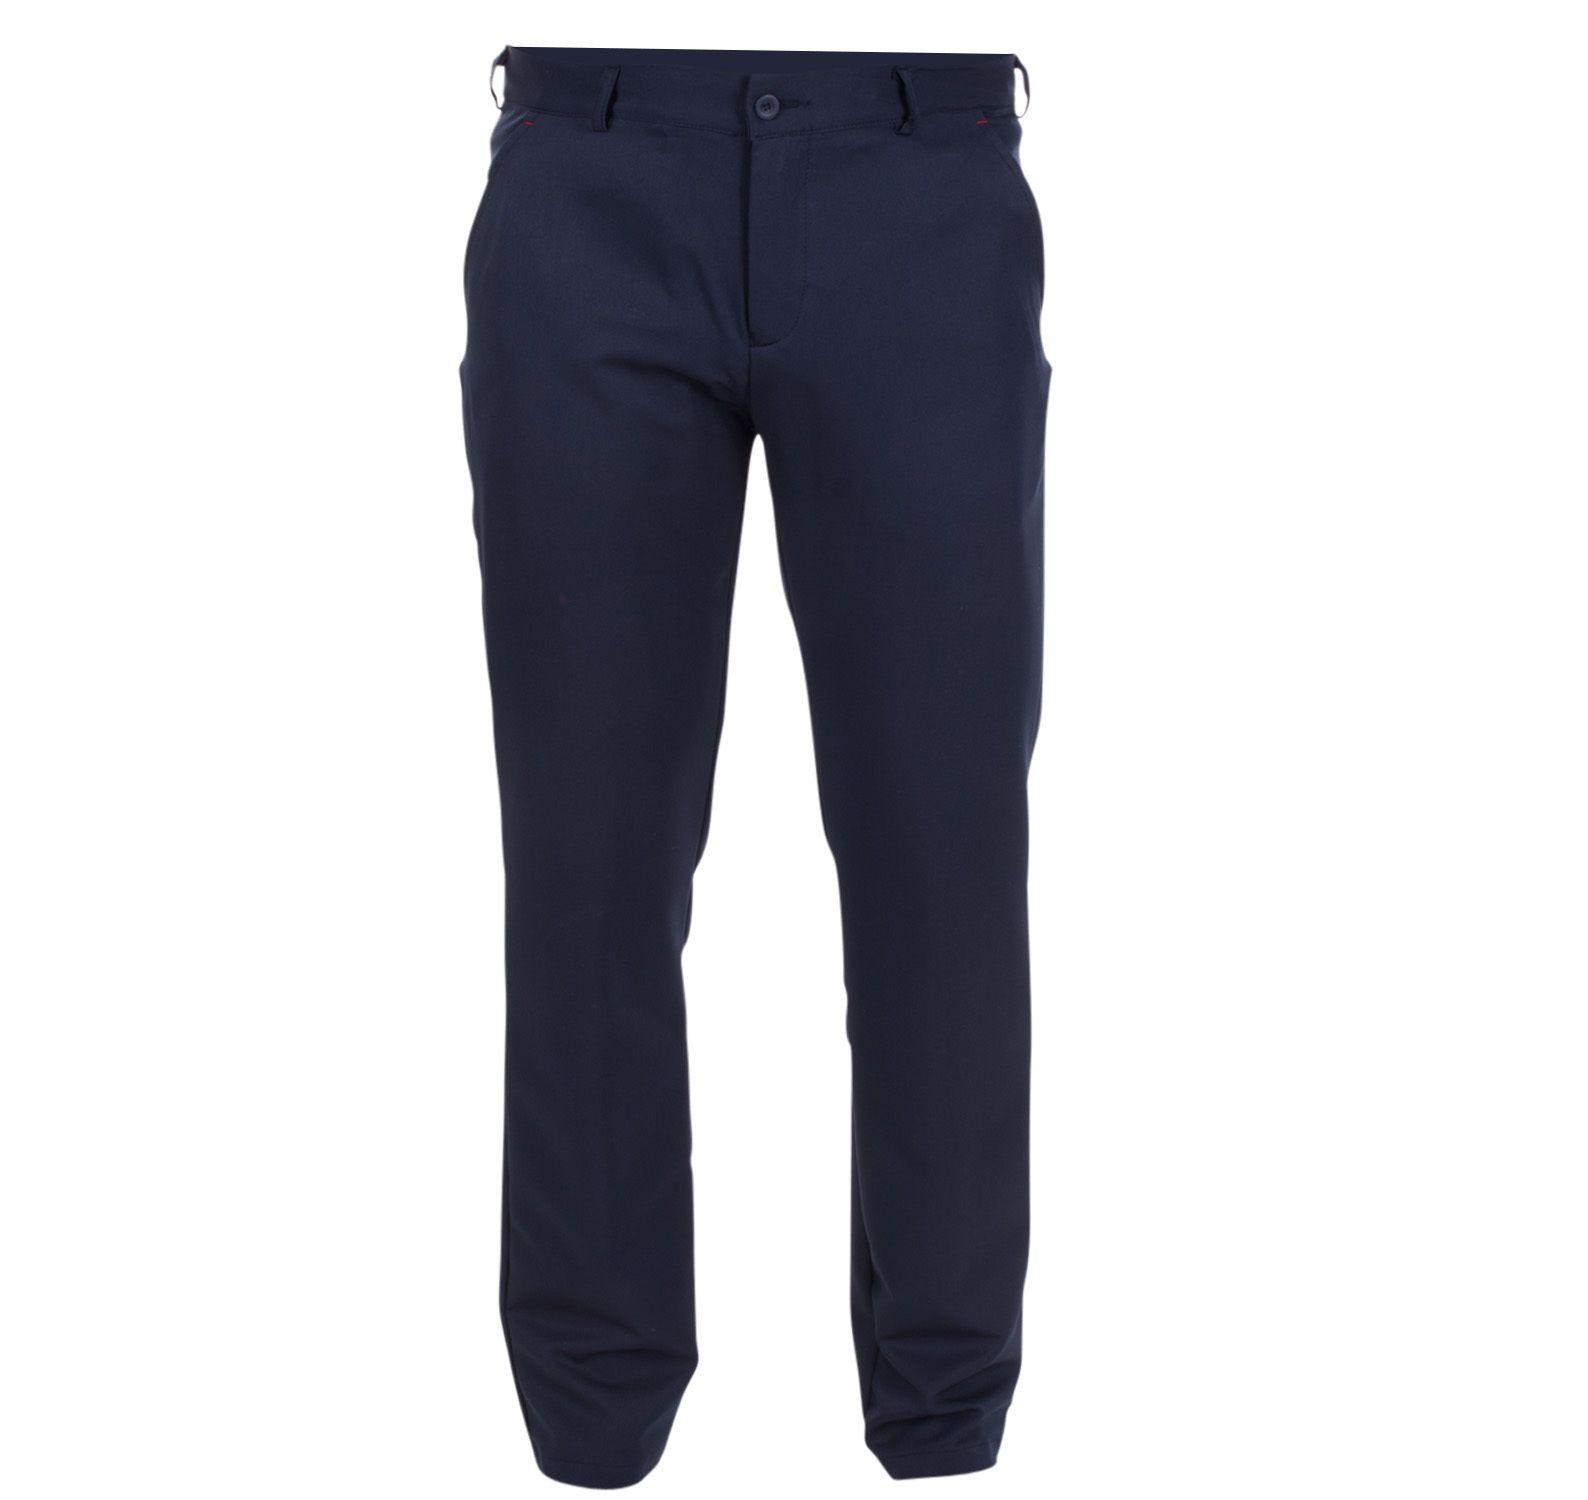 4way trouser 1740 black 30/32, navy, 32/32, varumärken